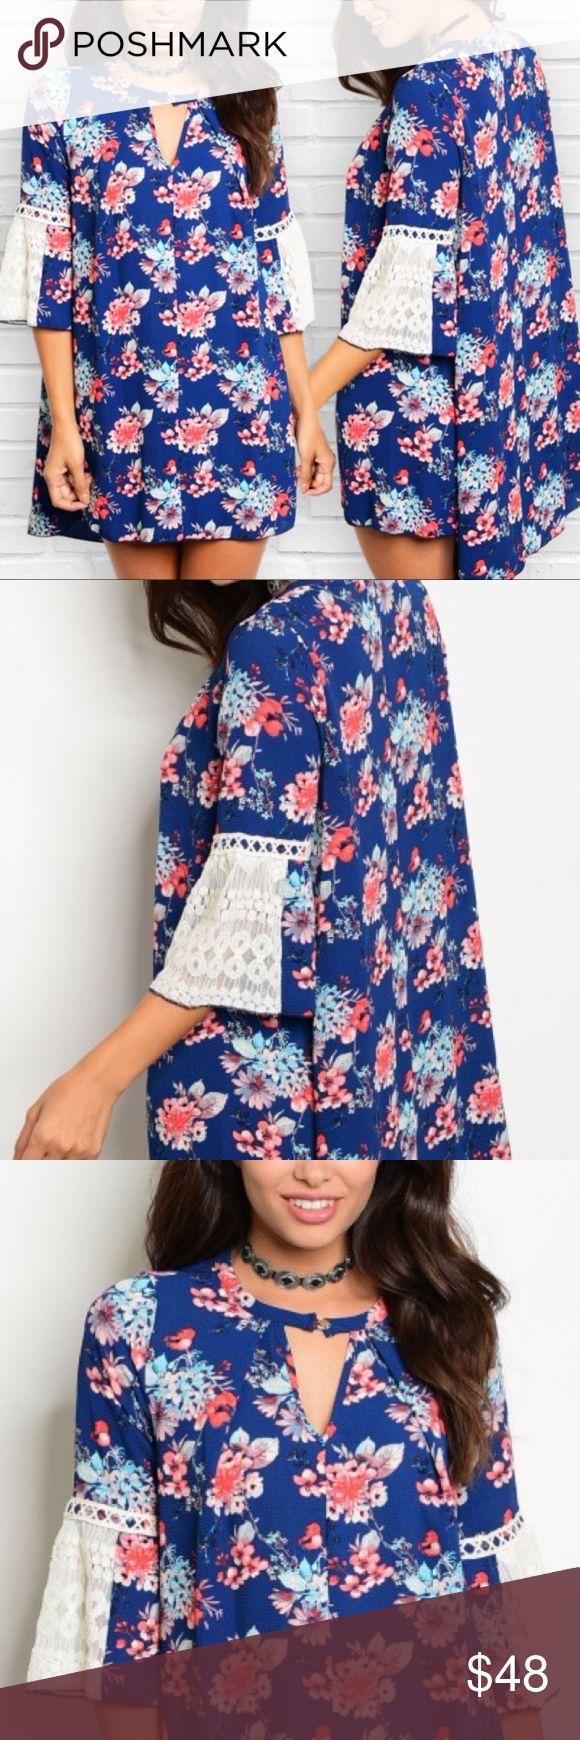 Navy Floral Bell Crochet Sleeve Dress Navy Floral Bell Crochet Sleeve Dress  97% Polyester 3% Spandex  No trades. Price is firm unless bundled. Glamvault Dresses Mini